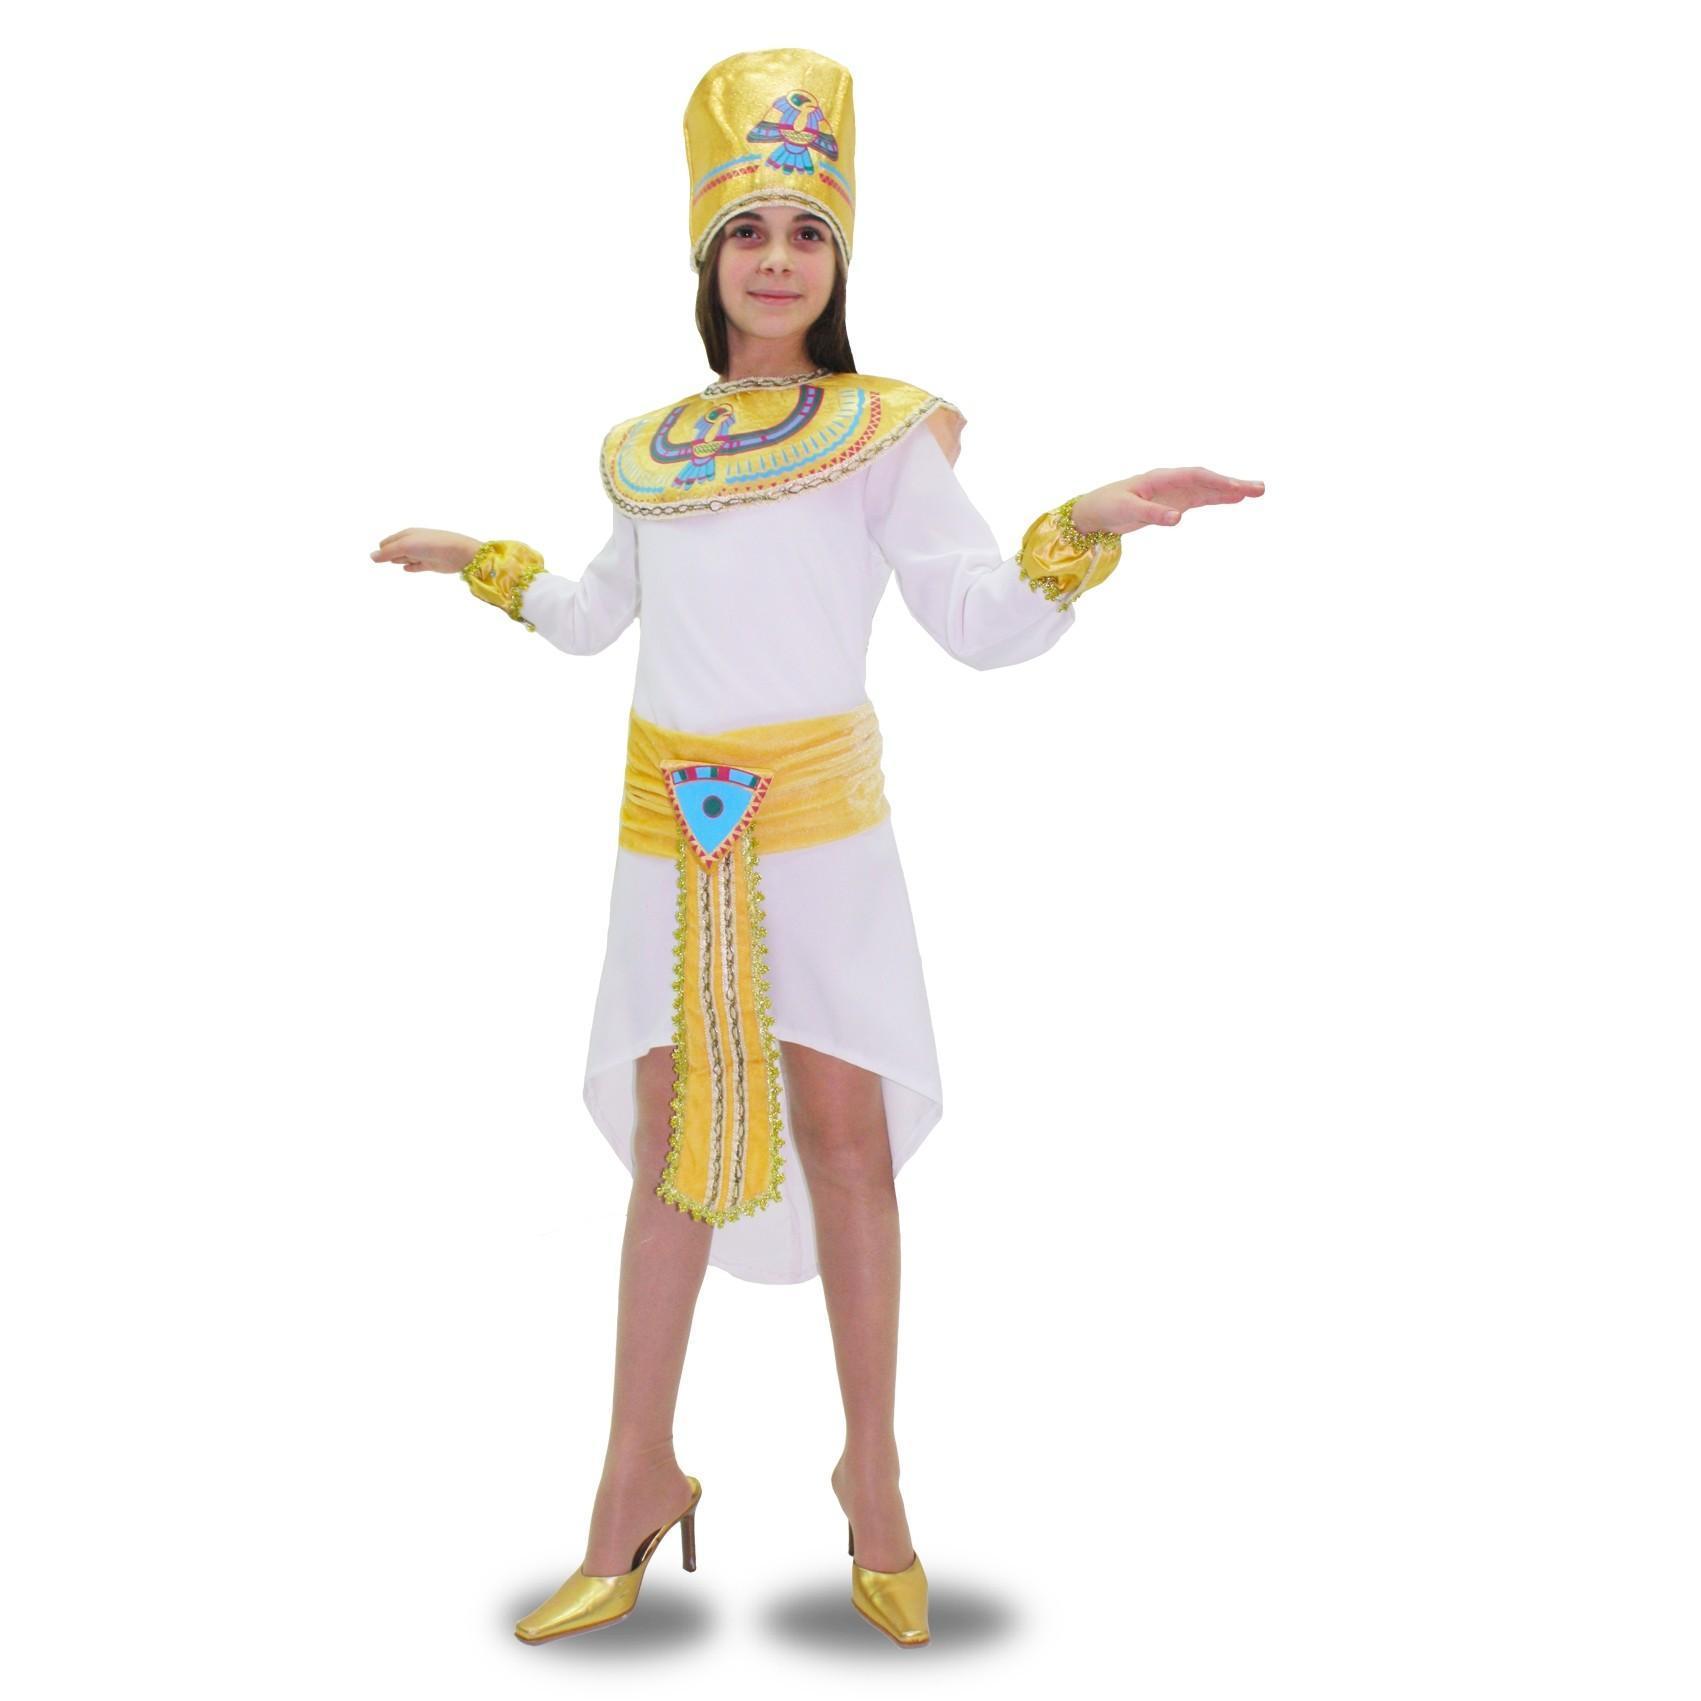 8c3db180f126 Costume Bambina Cleopatra 3-4 anni 7026 - Tuttogiochi D'Amadio Srls